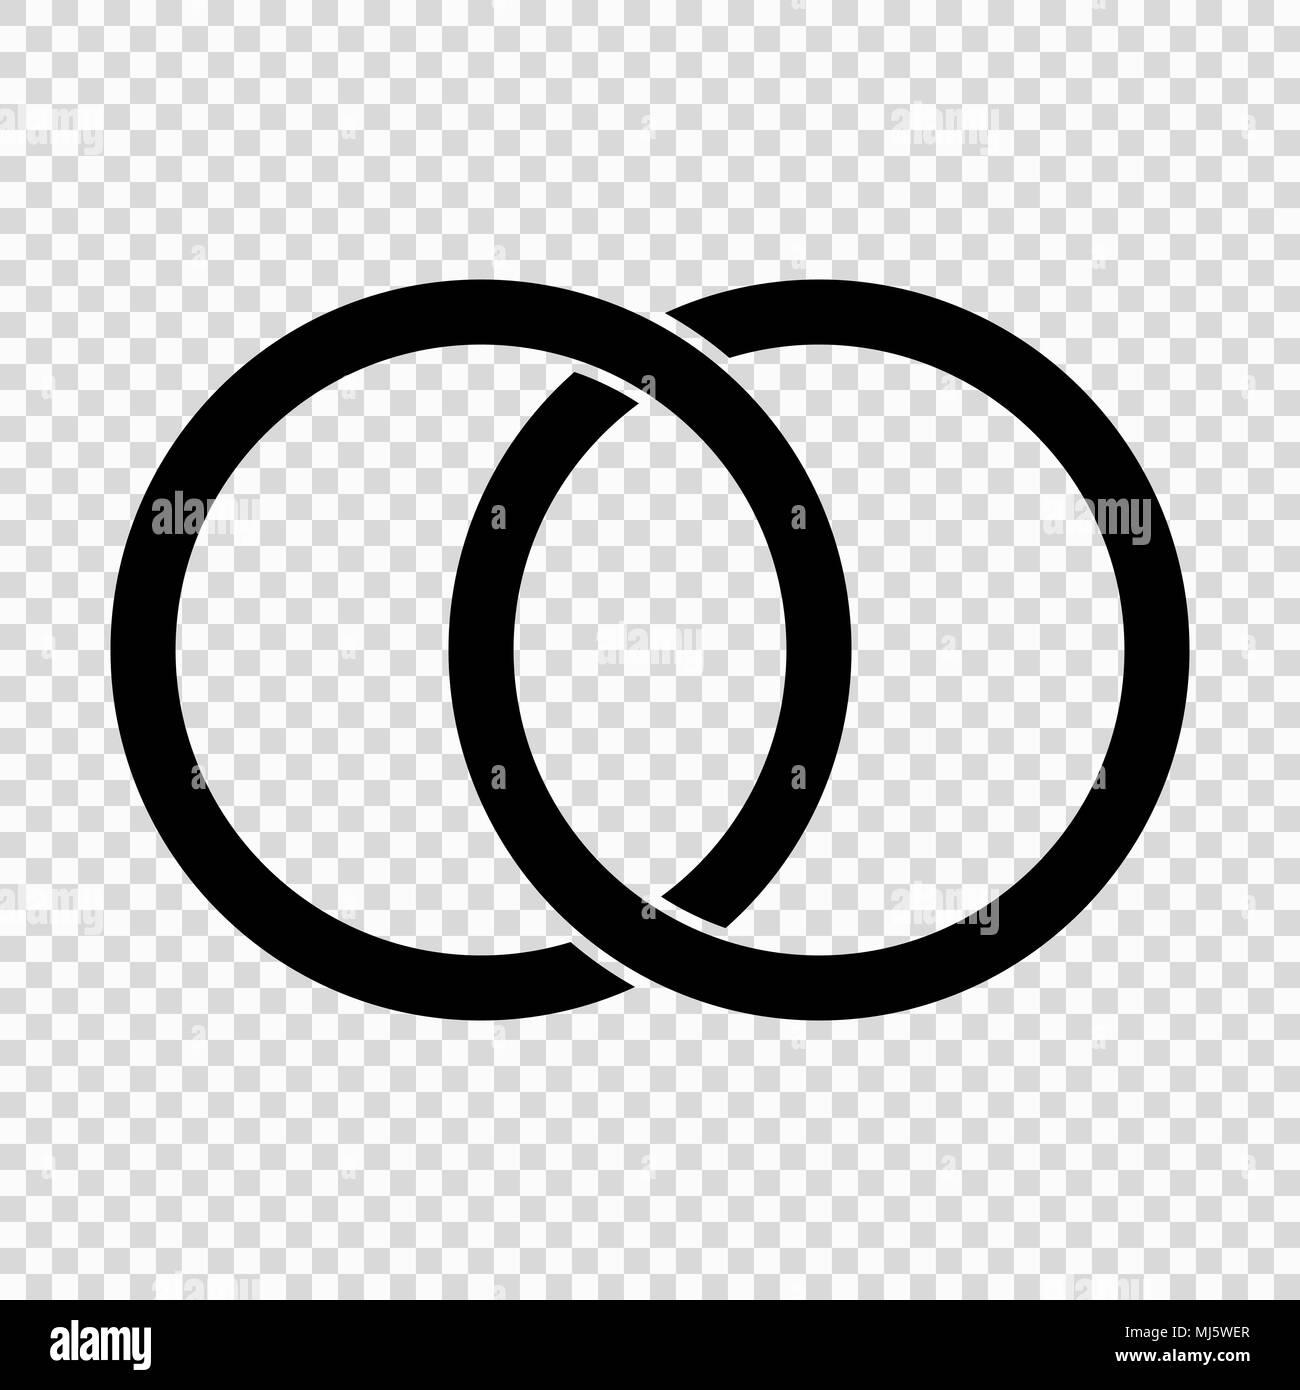 Kreise Ringe Konzept Symbol Vektor Abbildung Bild 183297263 Alamy